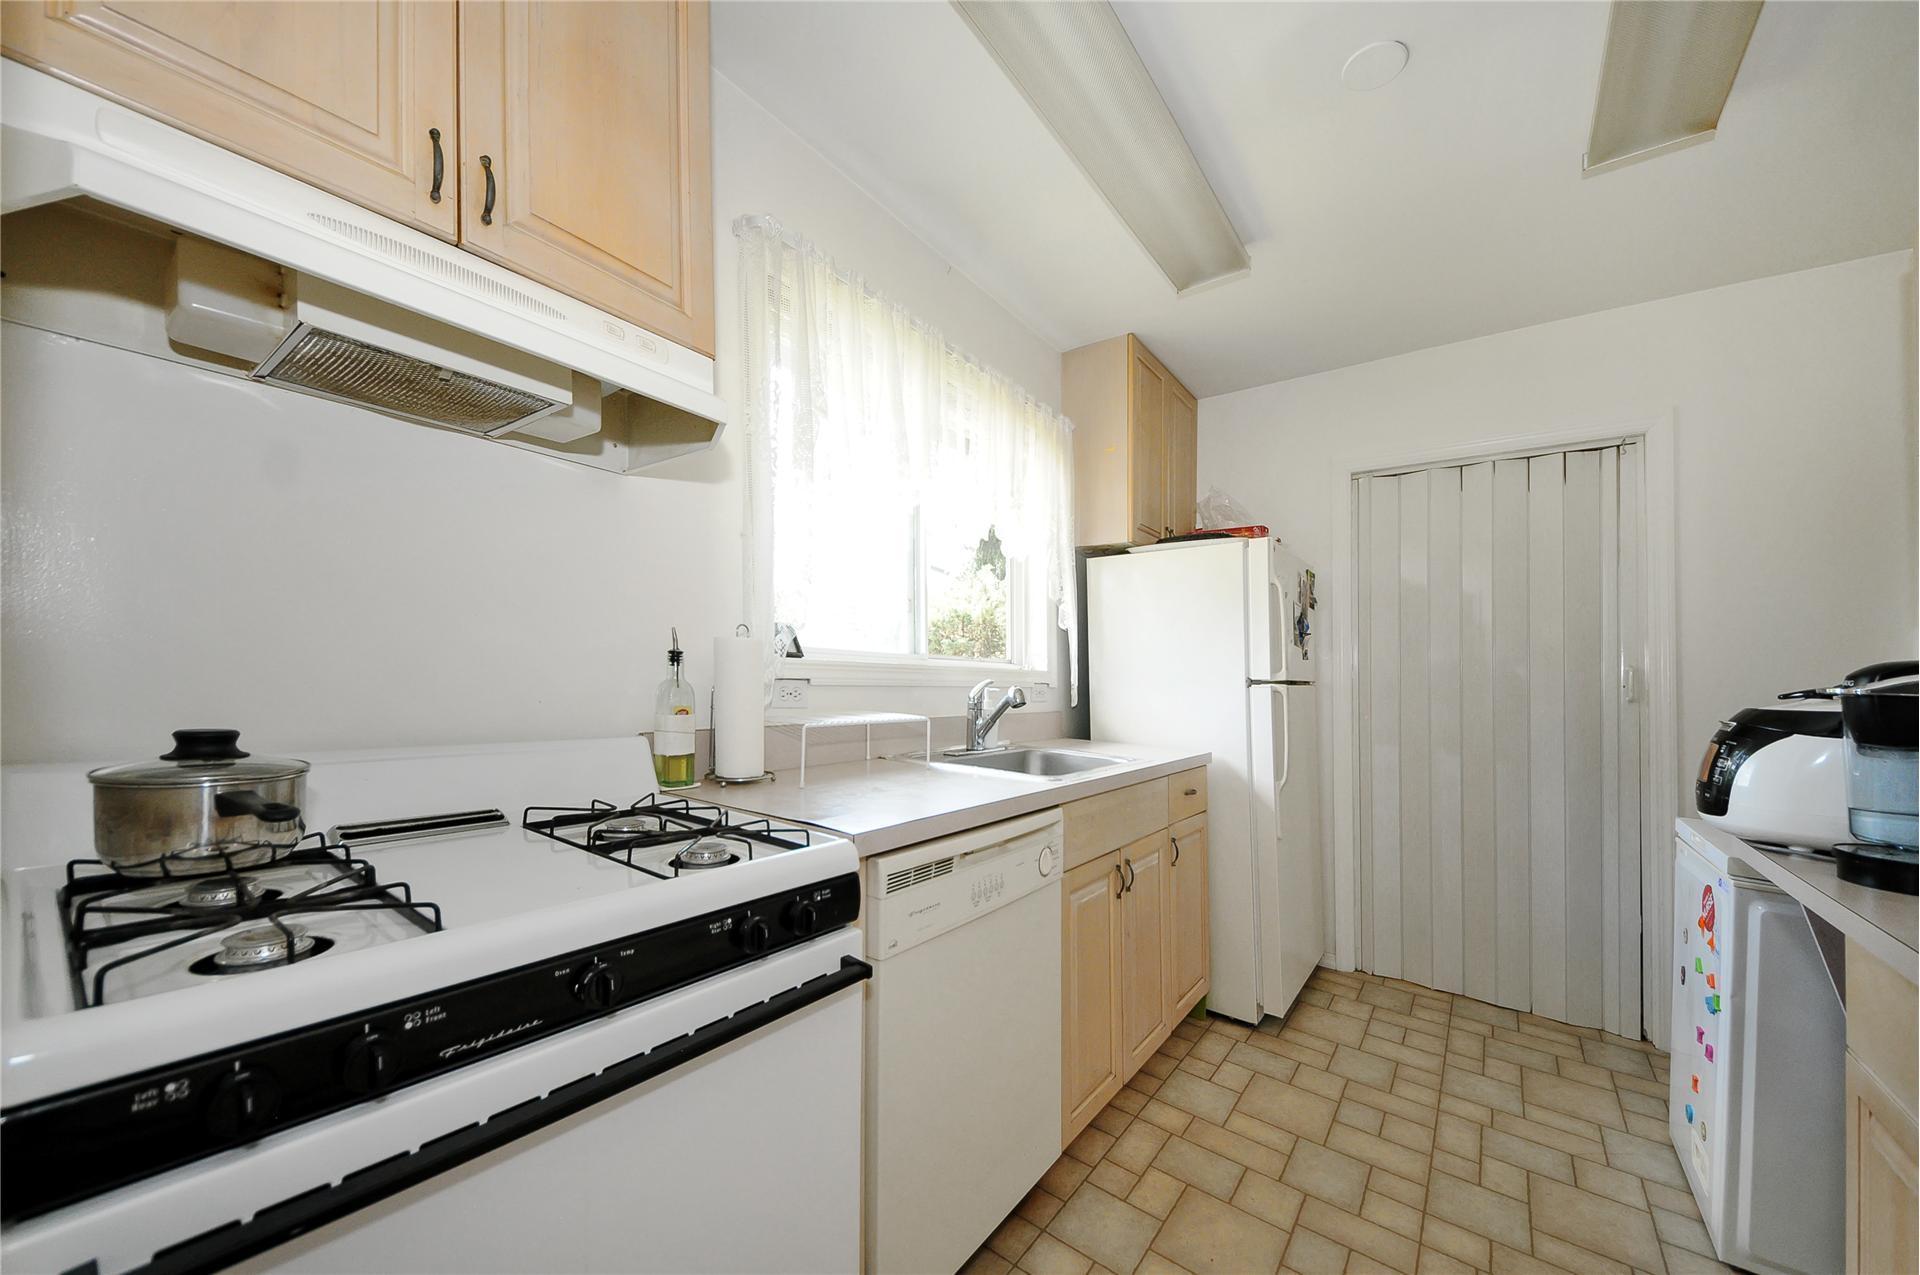 Contemporary Star Kitchen Plainview Ny Ornament - Kitchen Cabinets ...